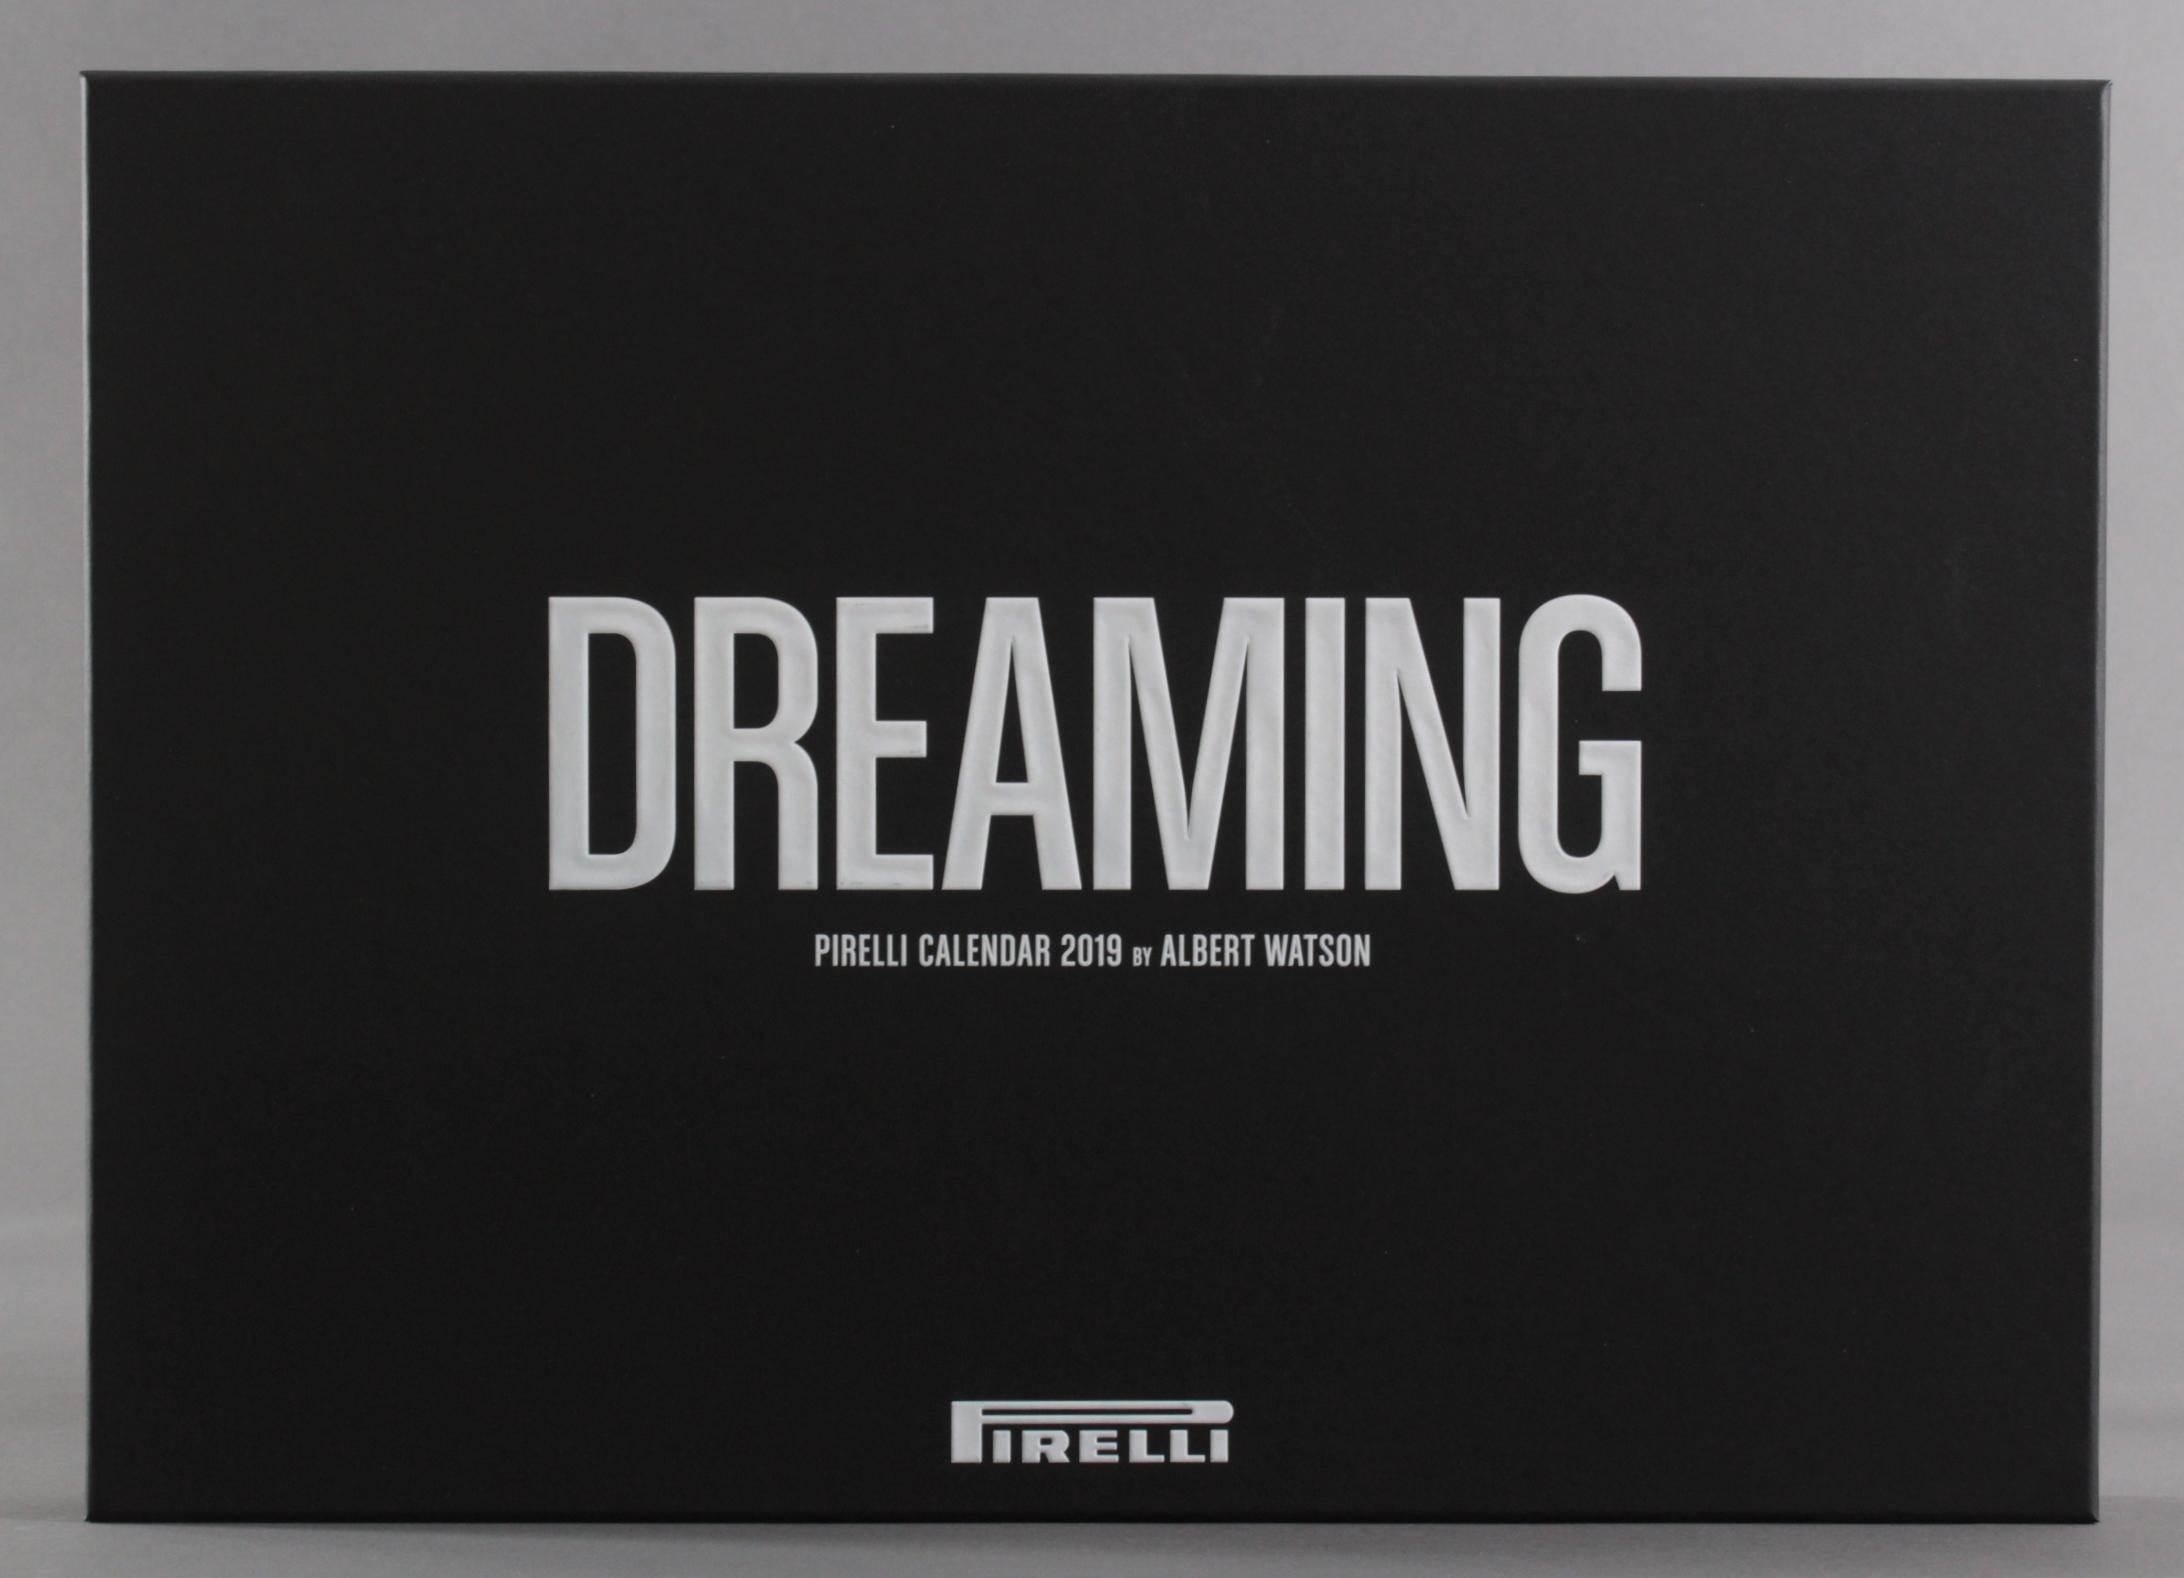 Pirelli Kalender 2019 'Dreaming'